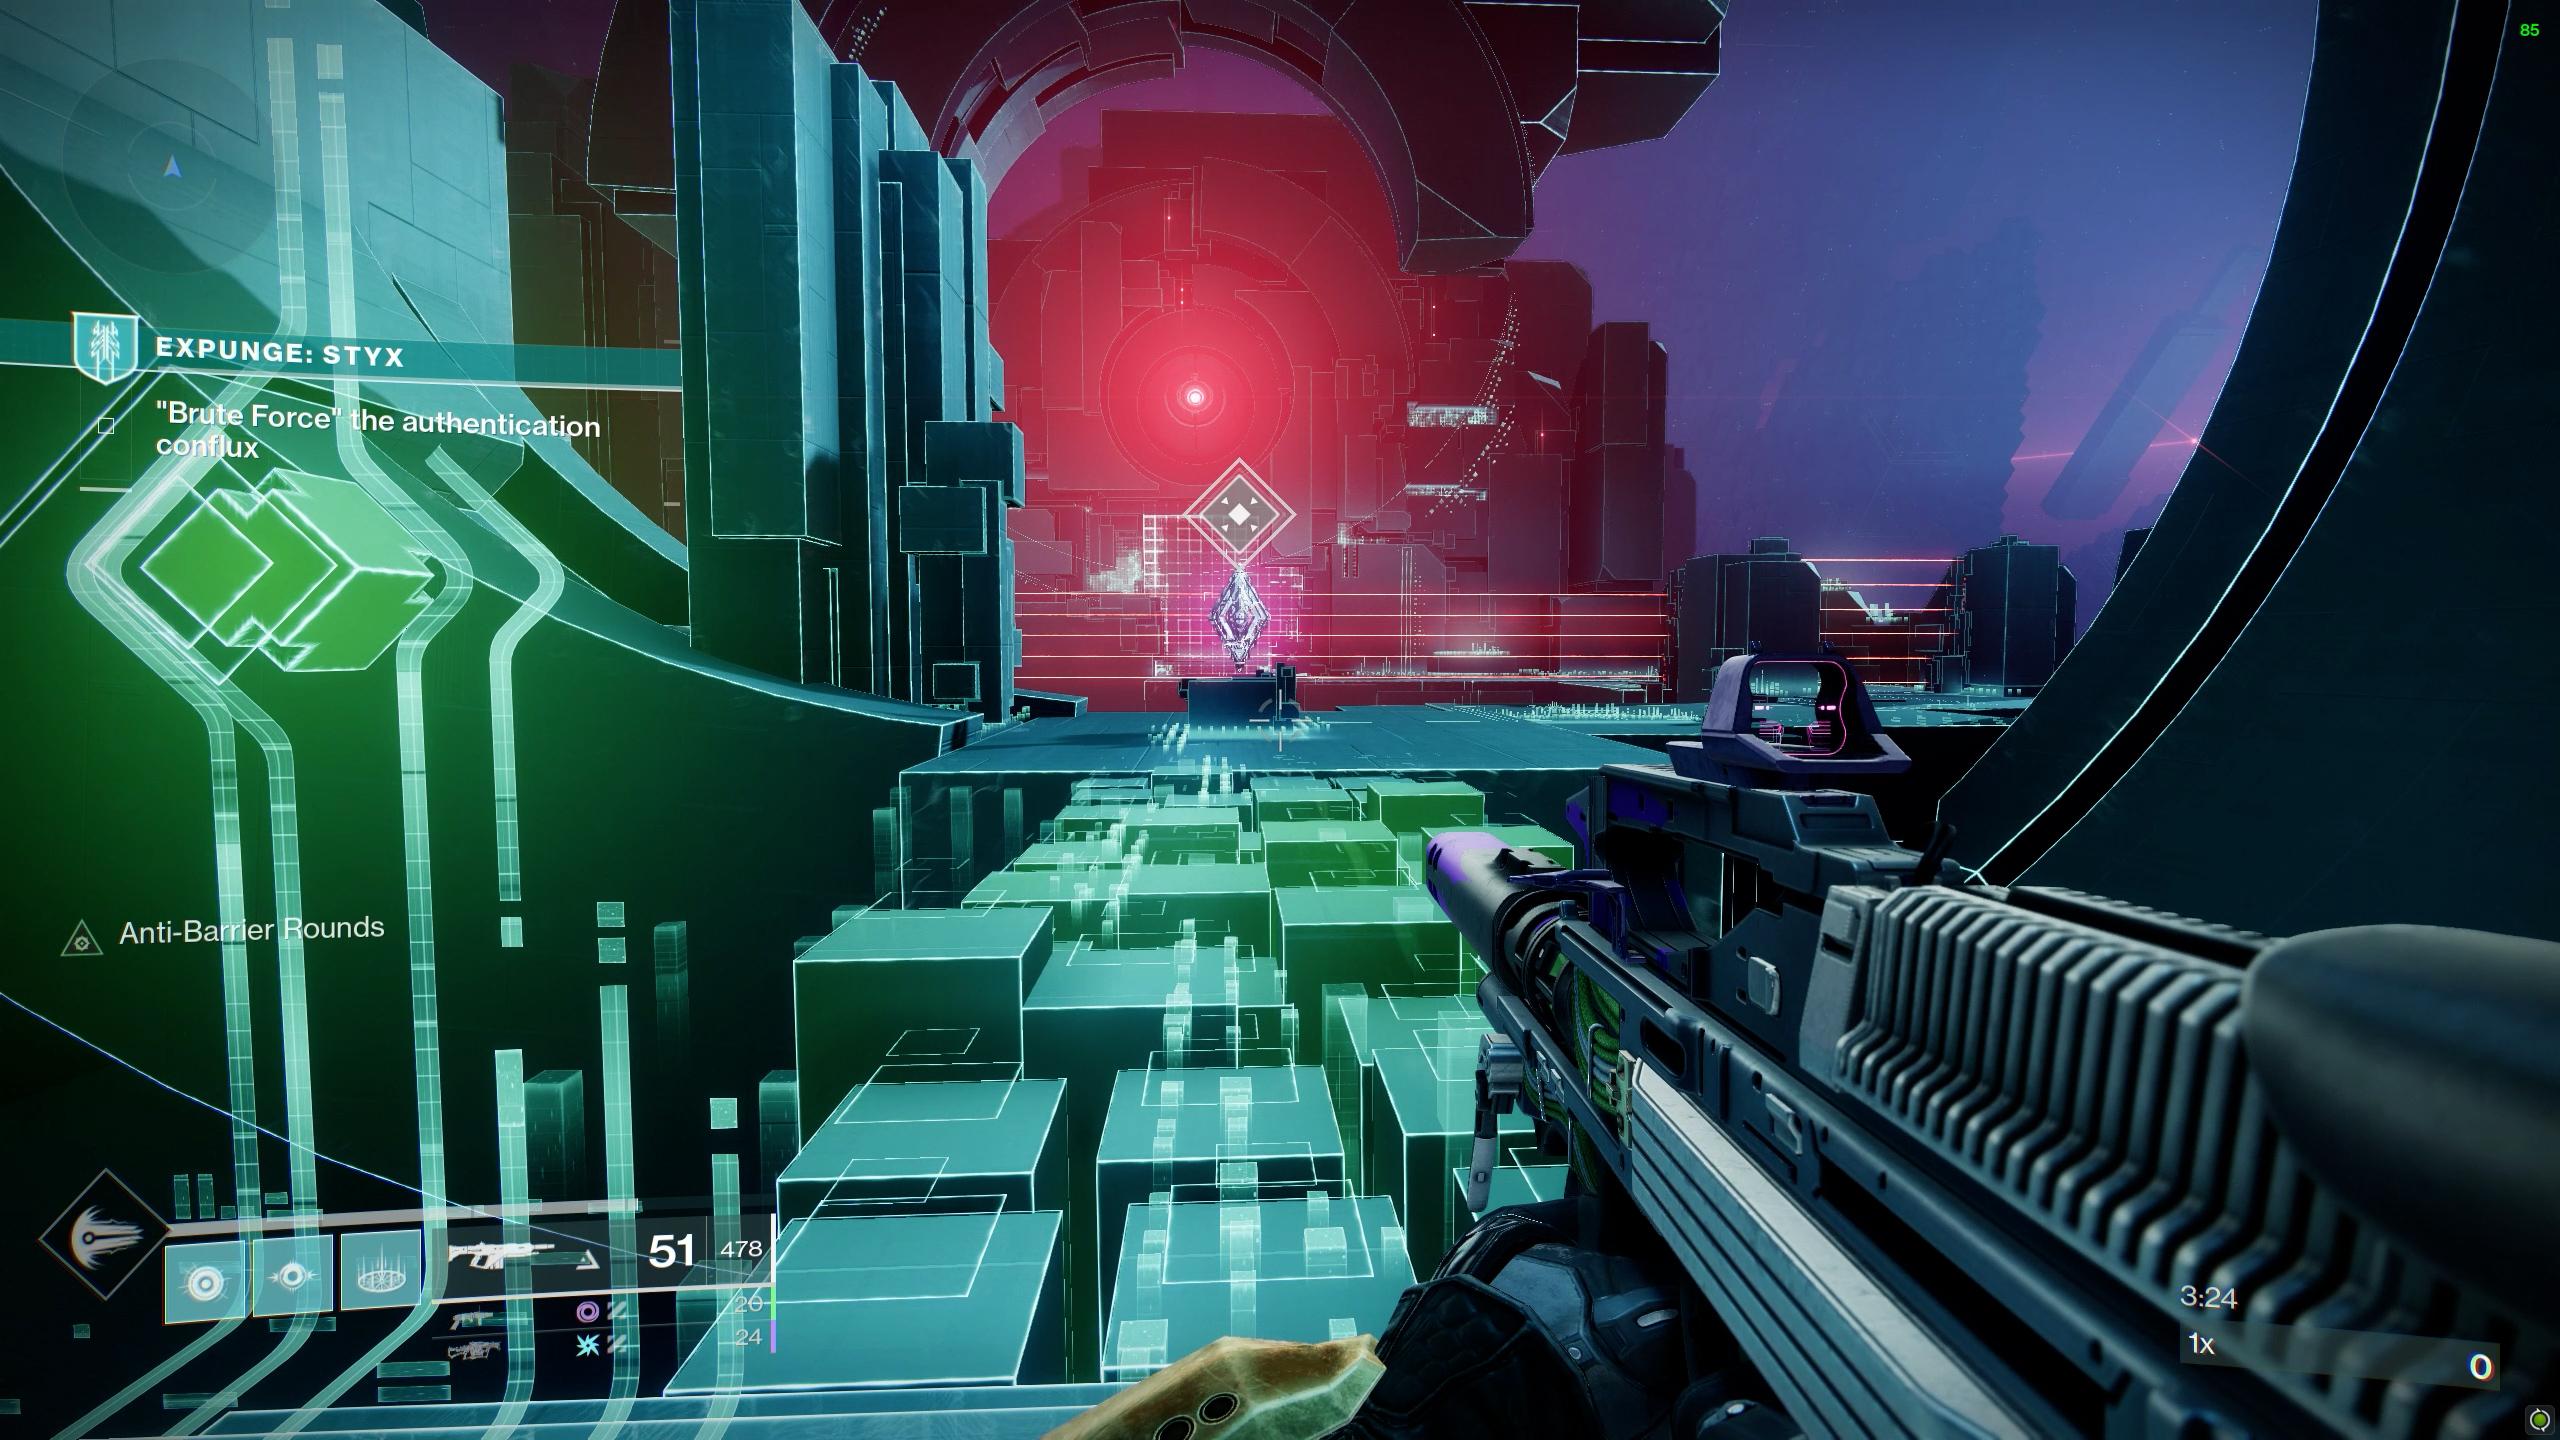 destiny 2 expunge styx